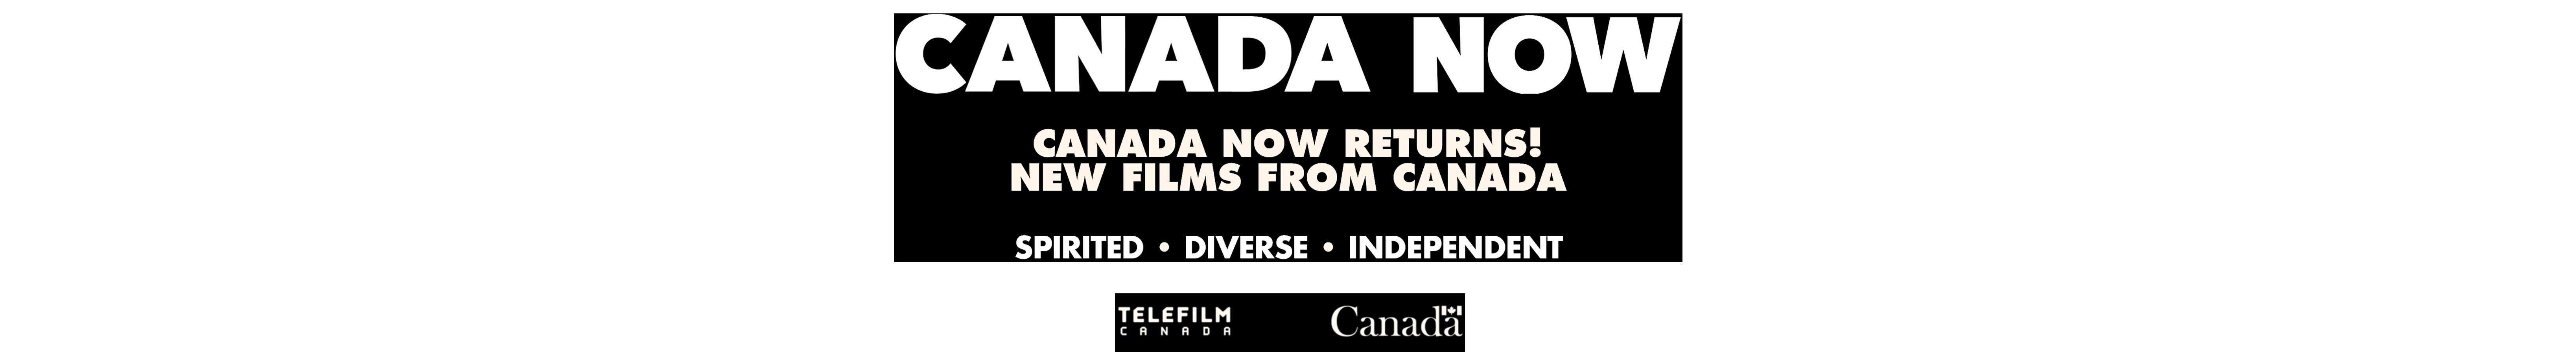 CANADA NOW PRESENTS